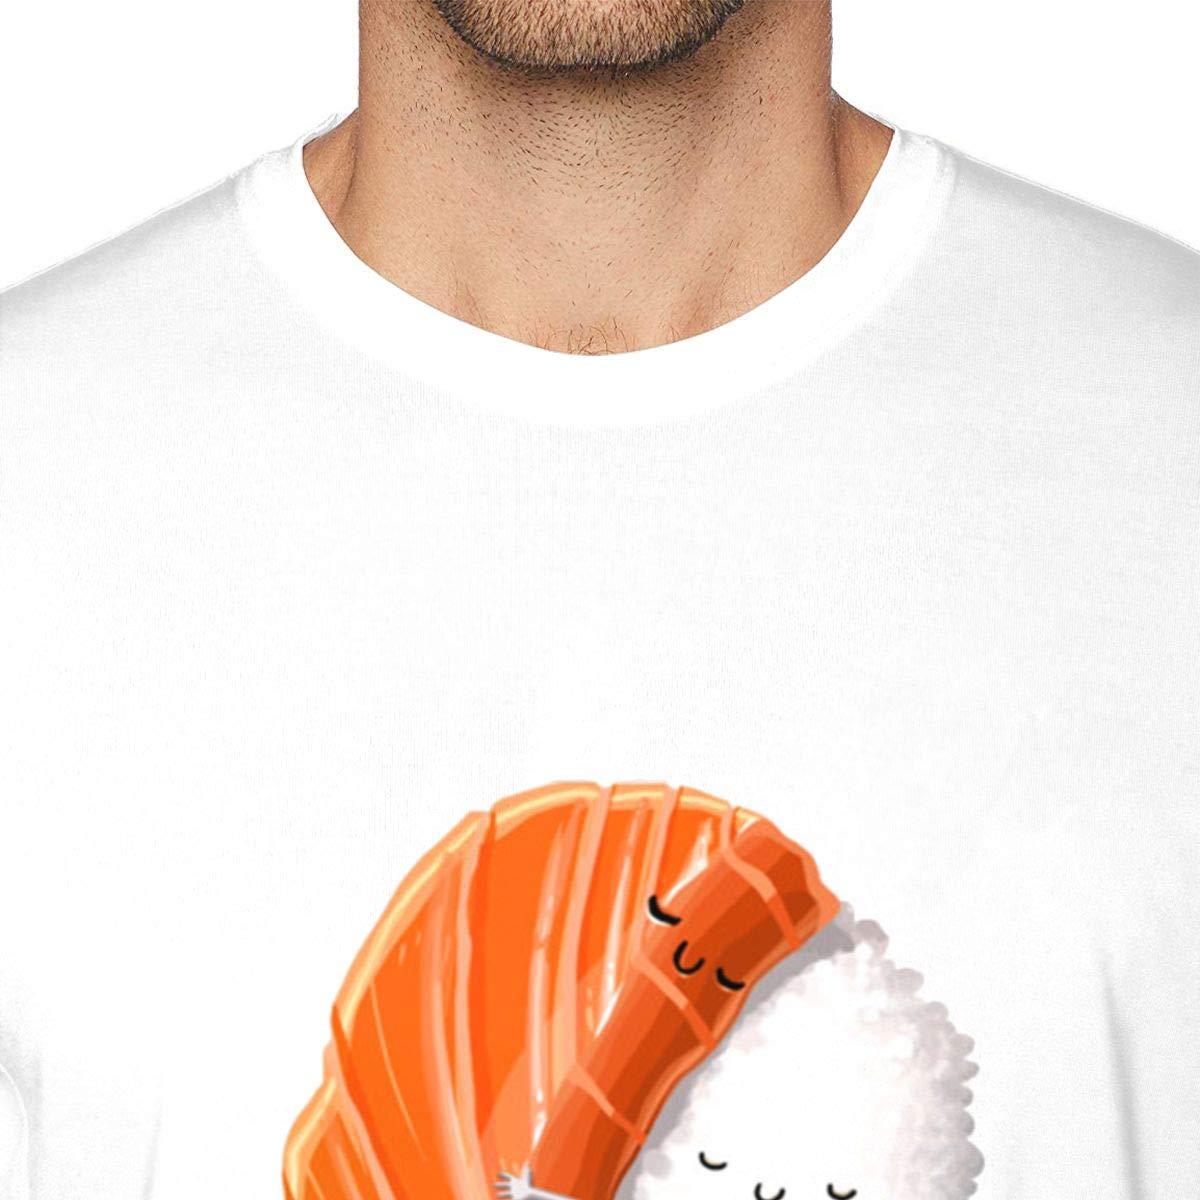 Sushi Mens Crew Neck Short Sleeve T-Shirt Casual Shirt for Men